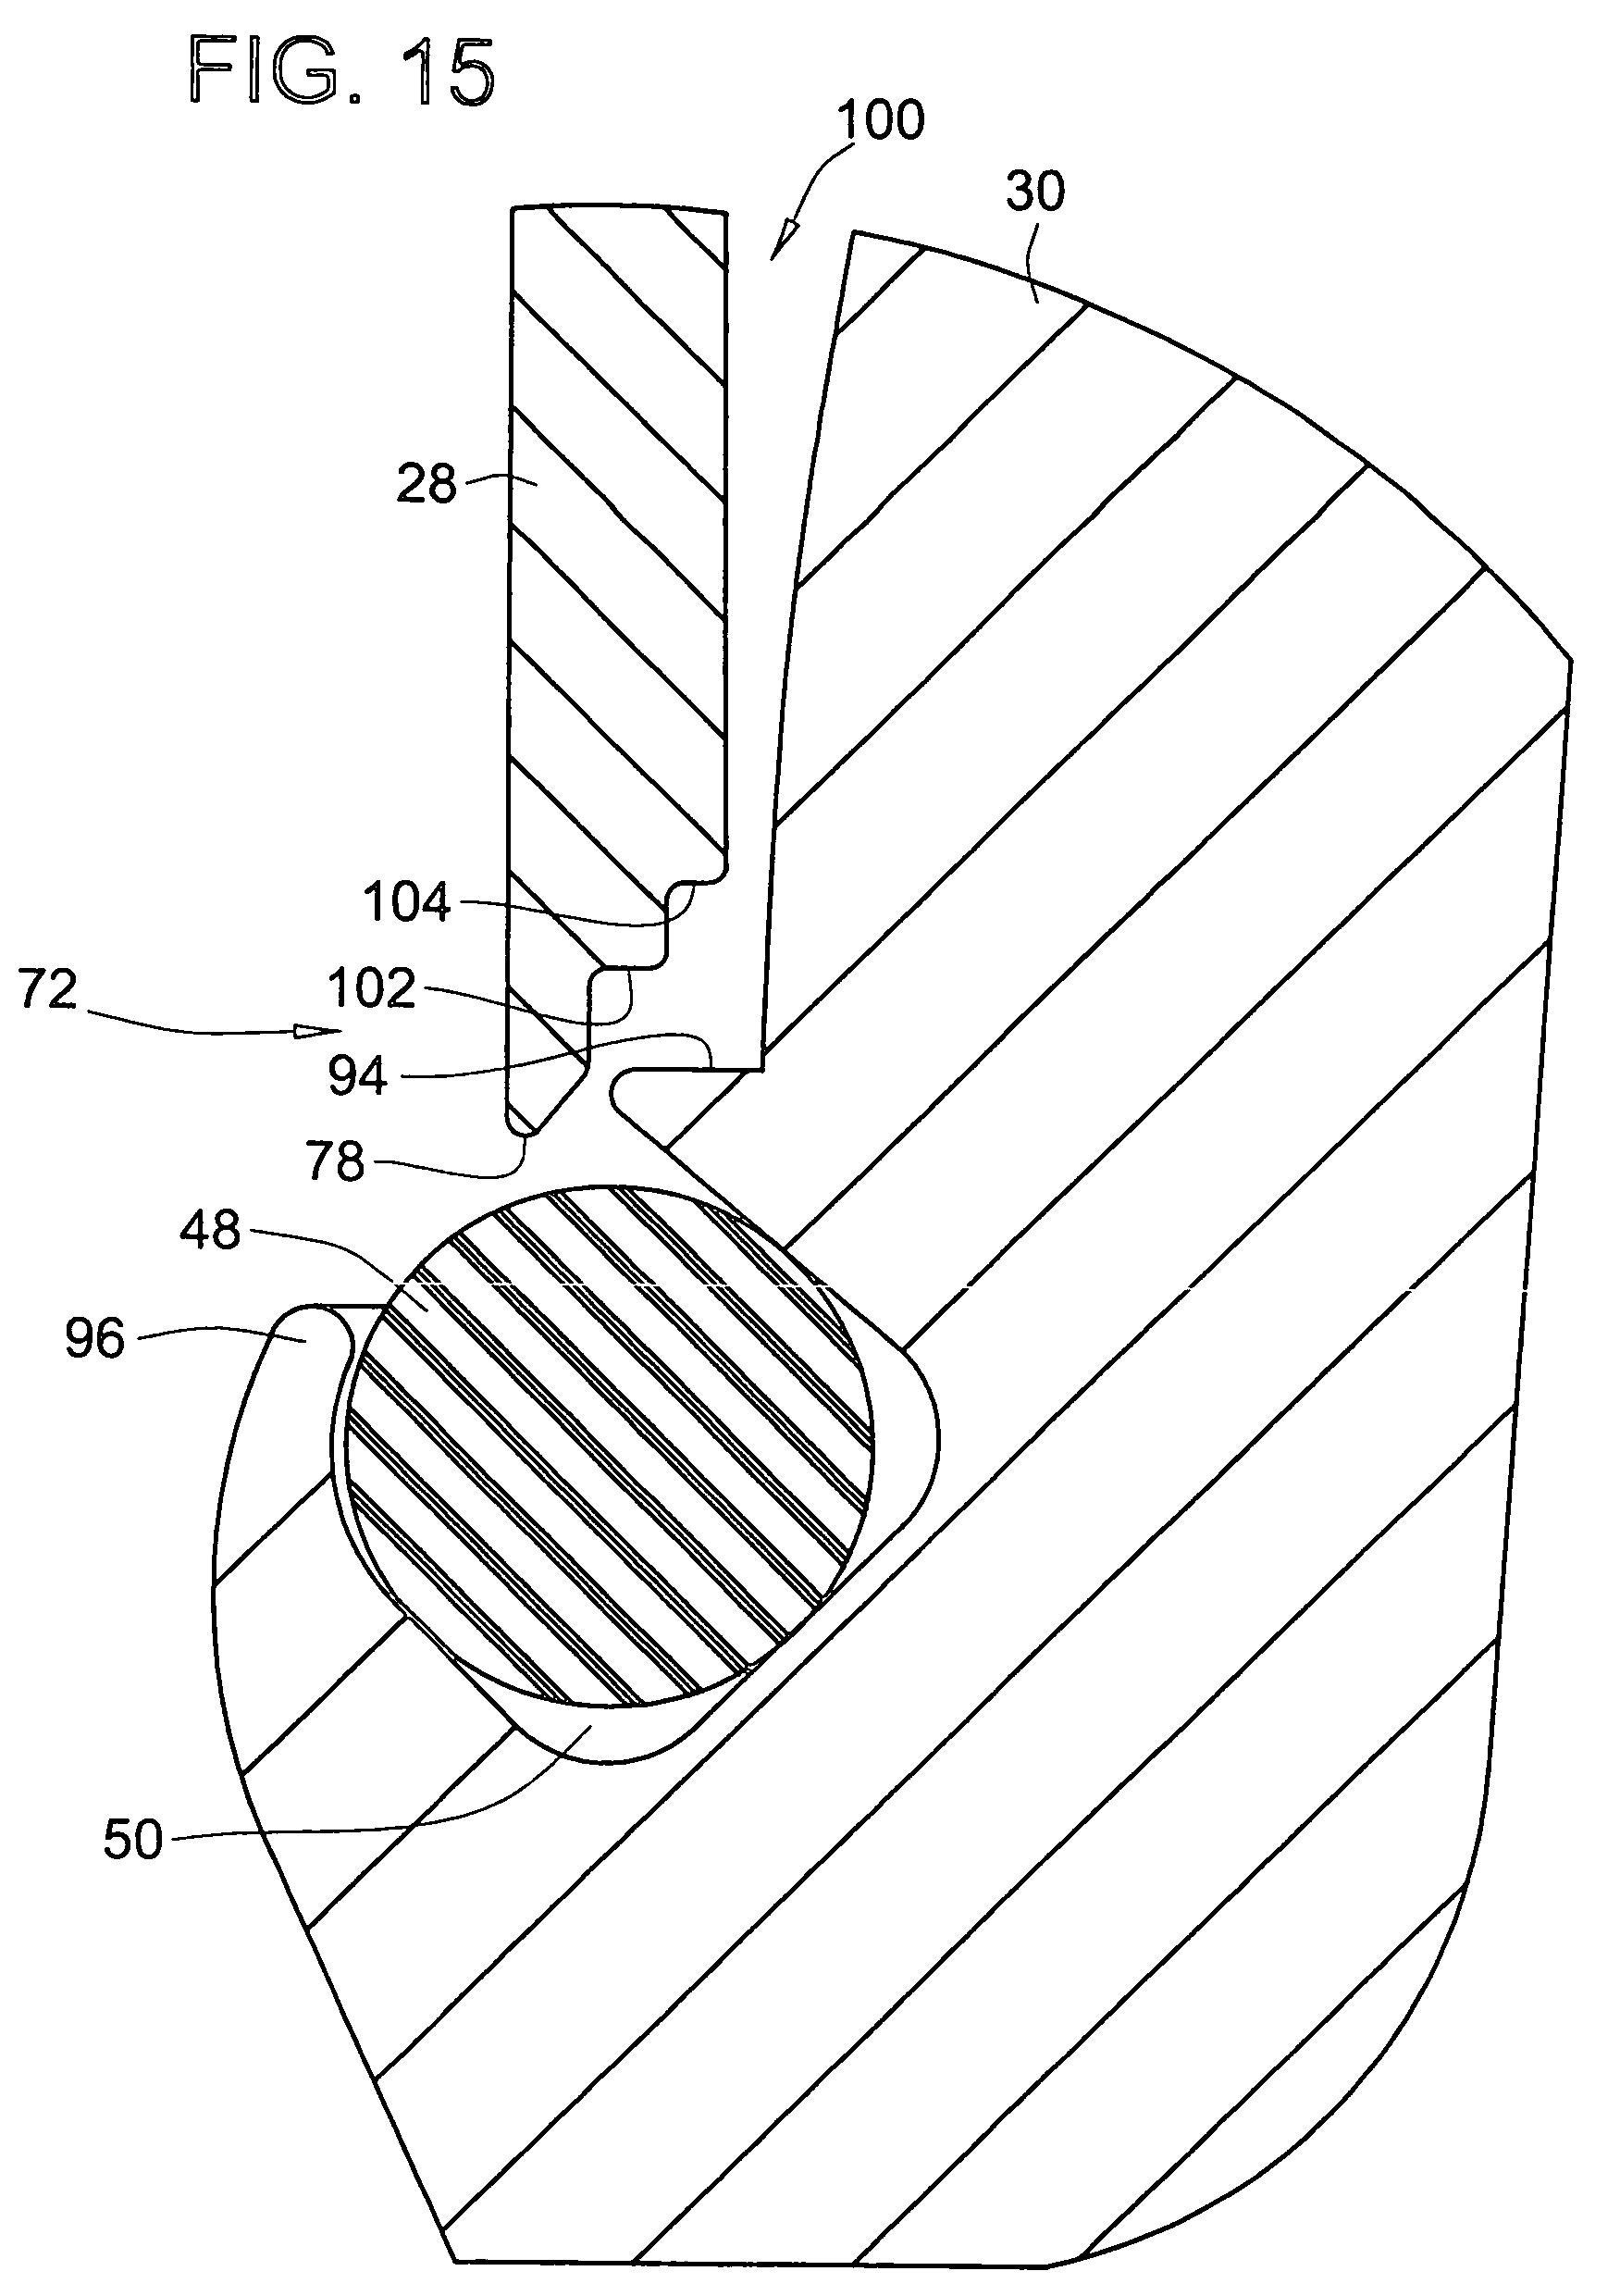 Wiring Diagram For Malibu Boat